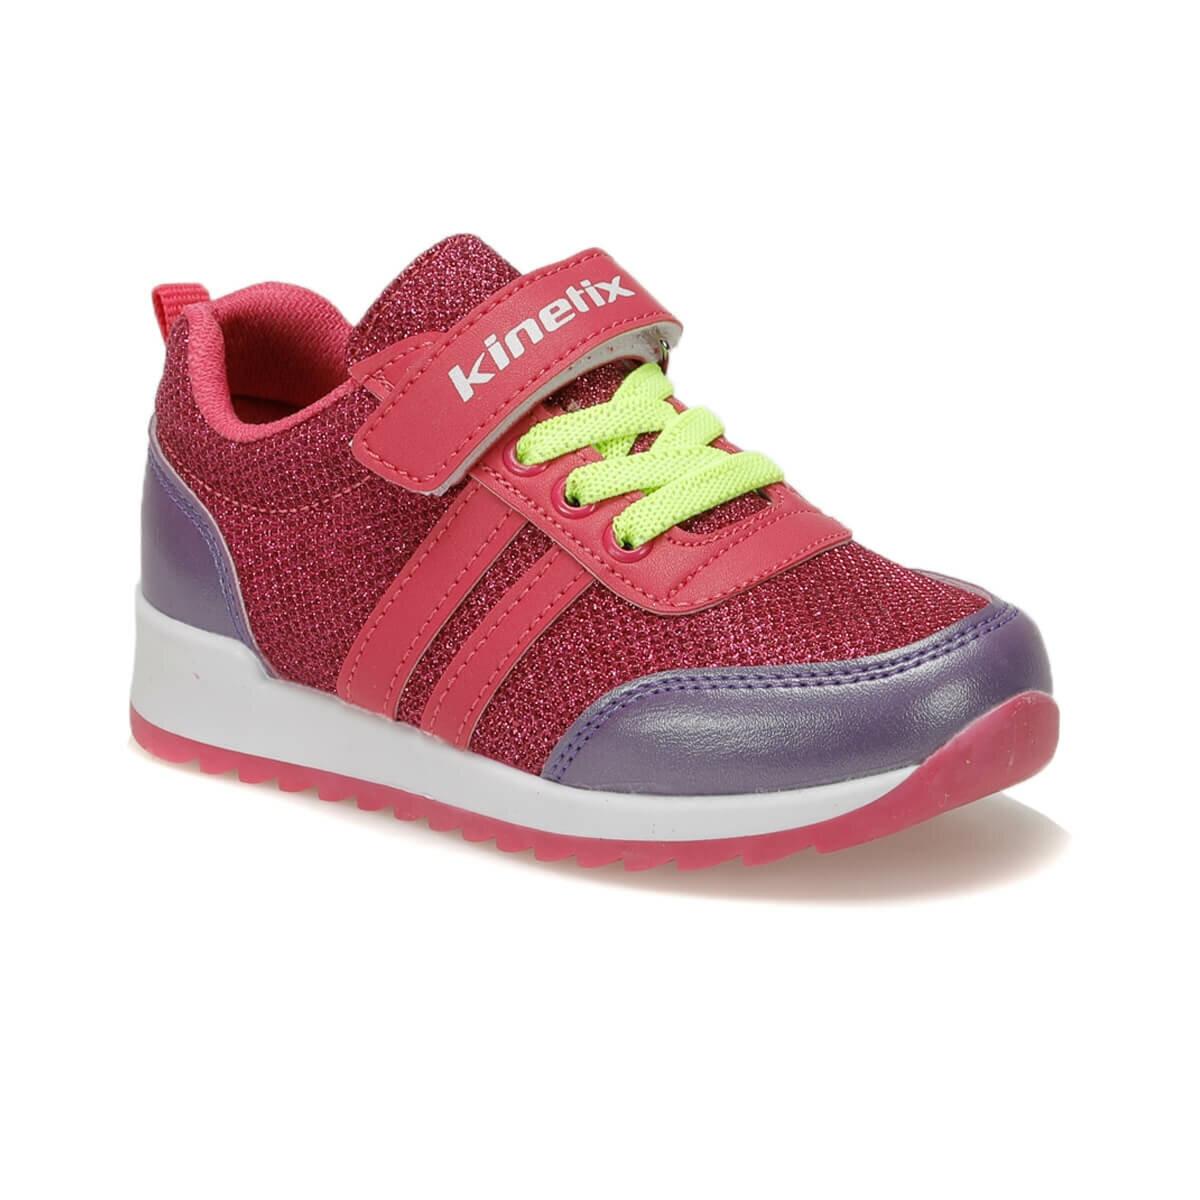 FLO VANES Fuchsia Female Child Sneaker Shoes KINETIX